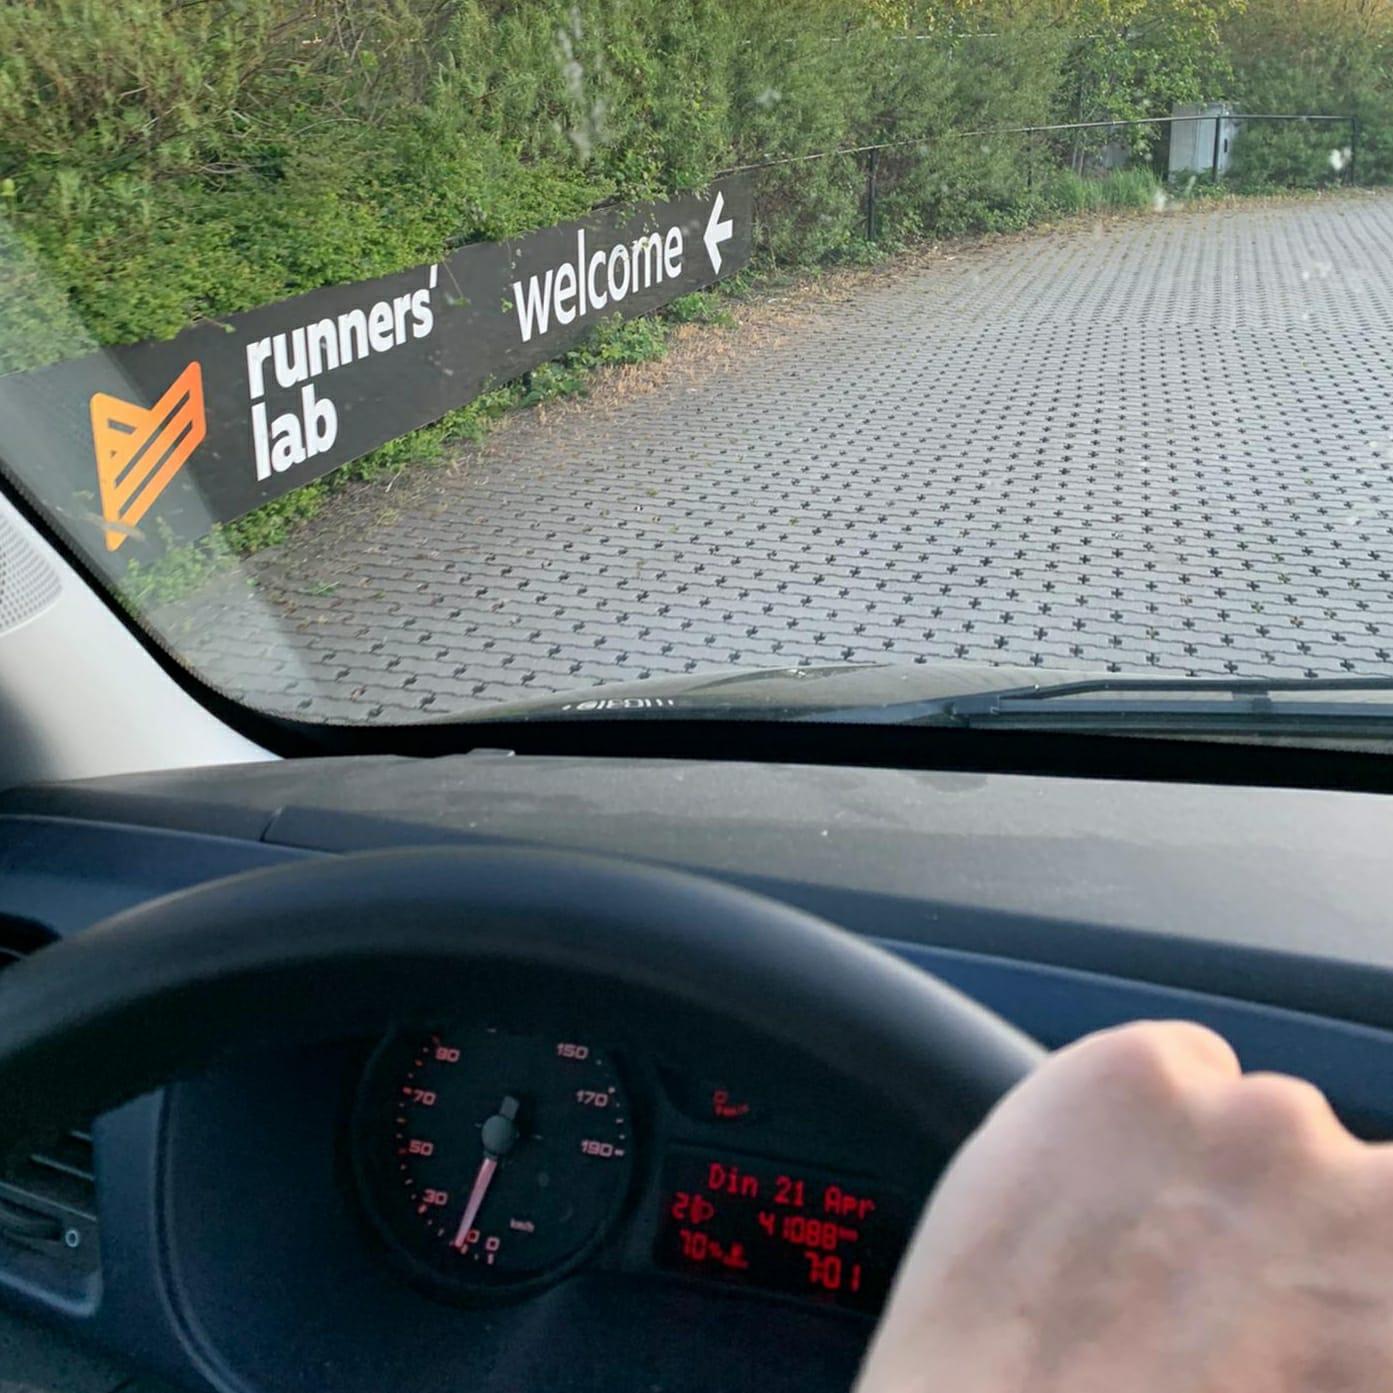 transport-webshop-bestellingen-runners-lab